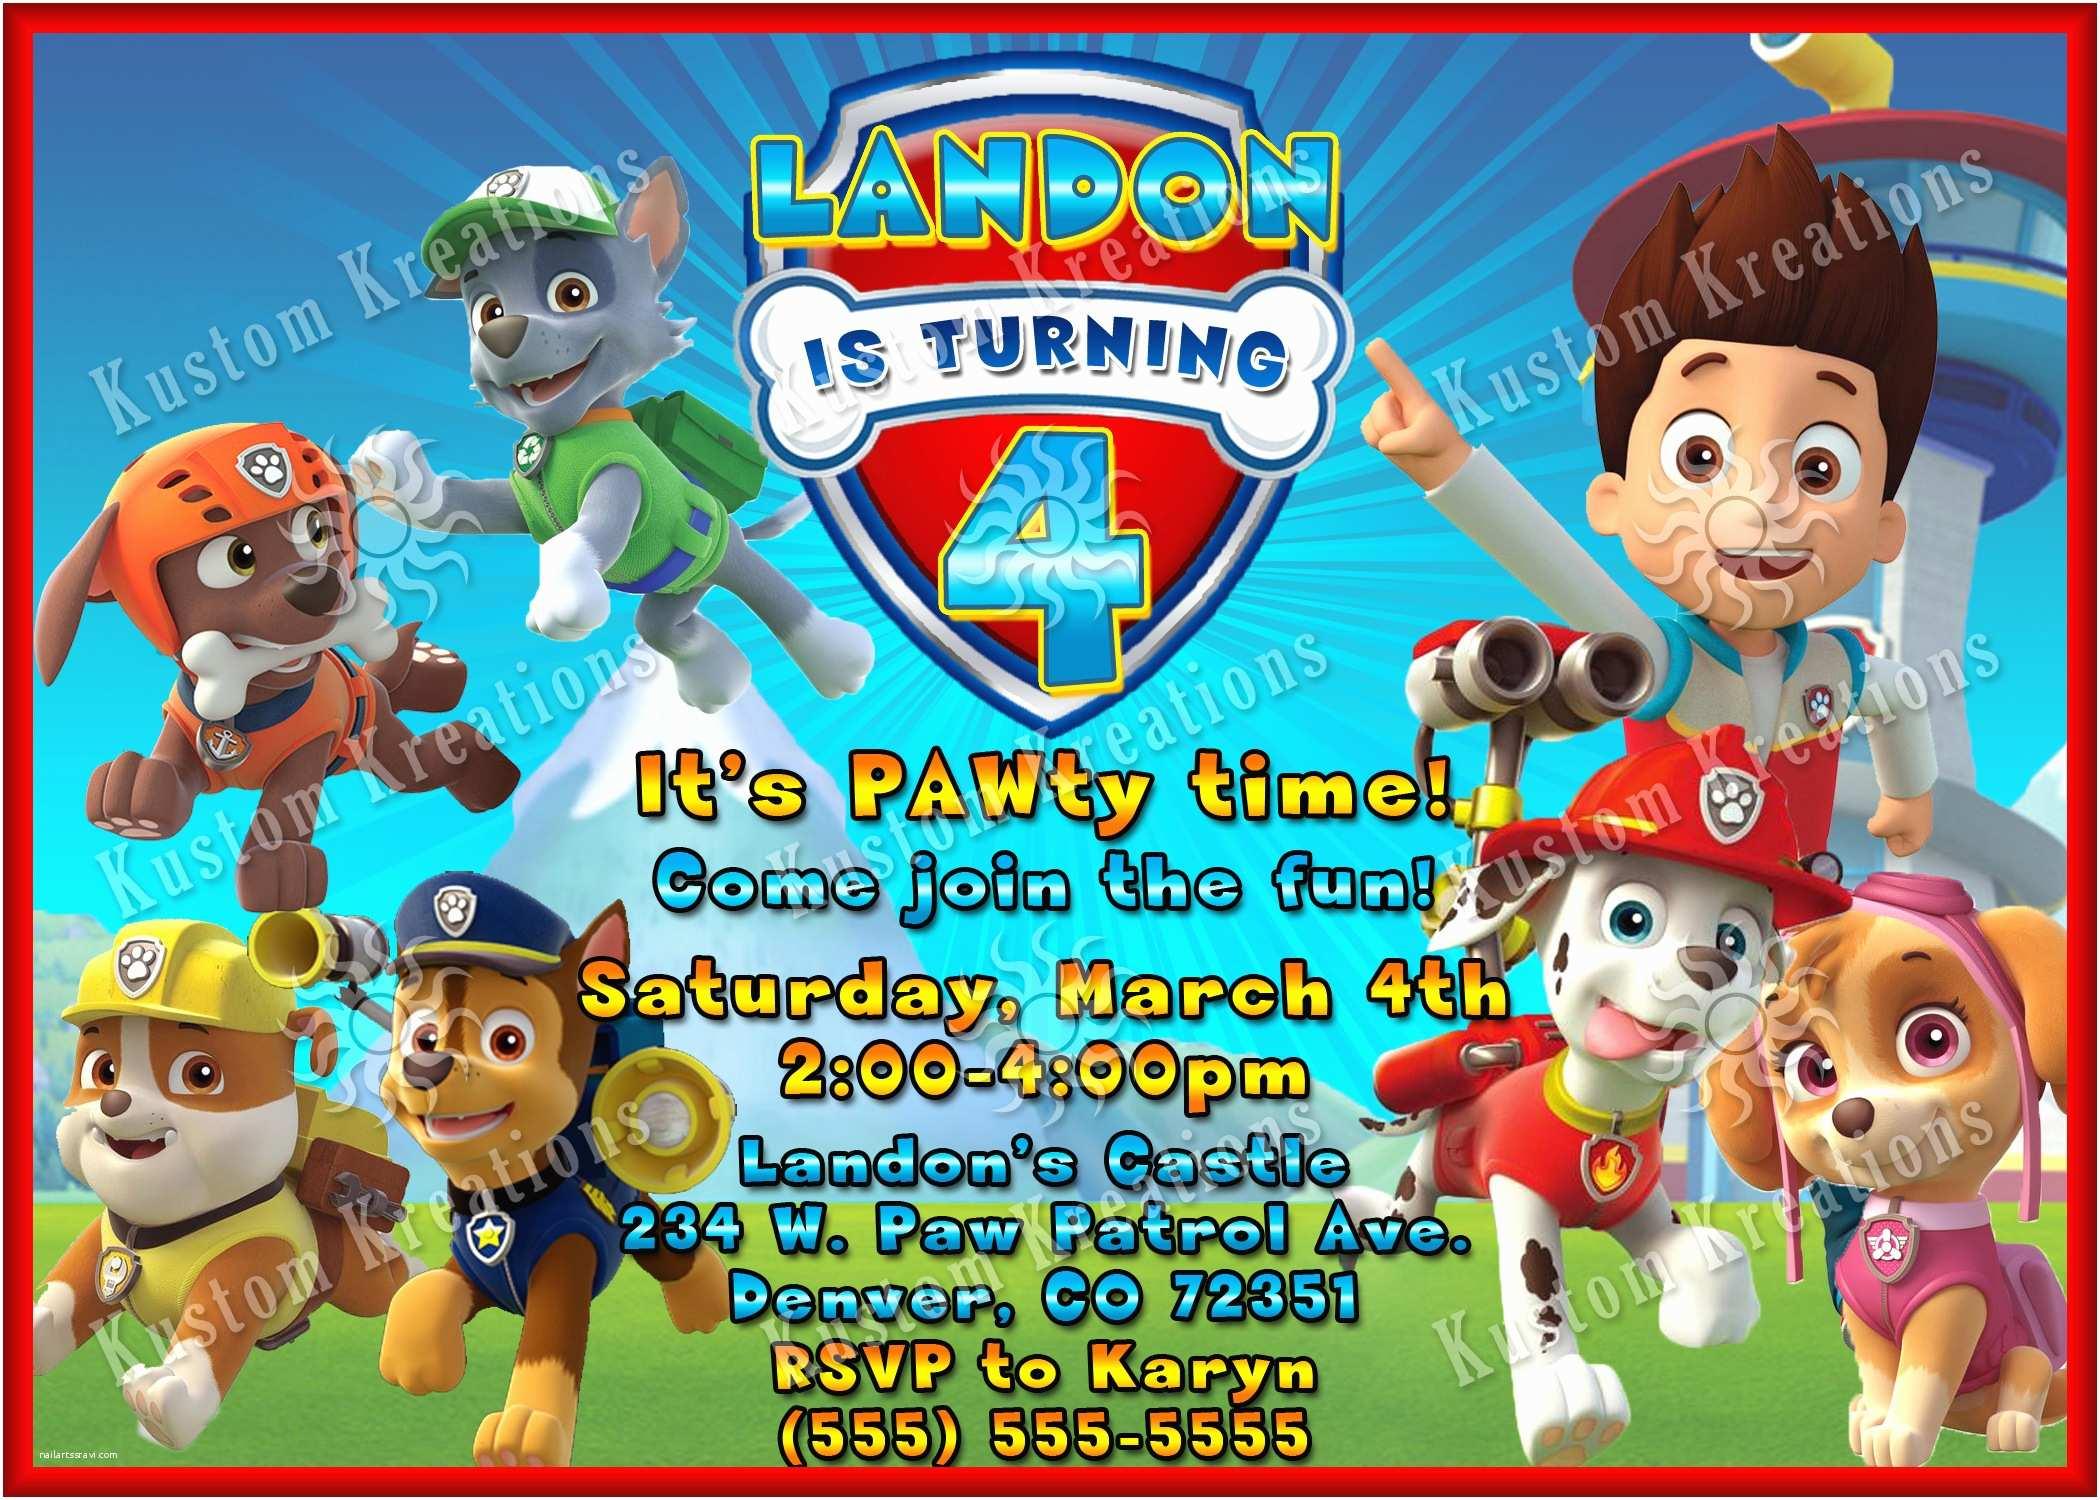 Paw Patrol Party Invitations Paw Patrol Birthday Invites Paw Patrol Birthday Invites as